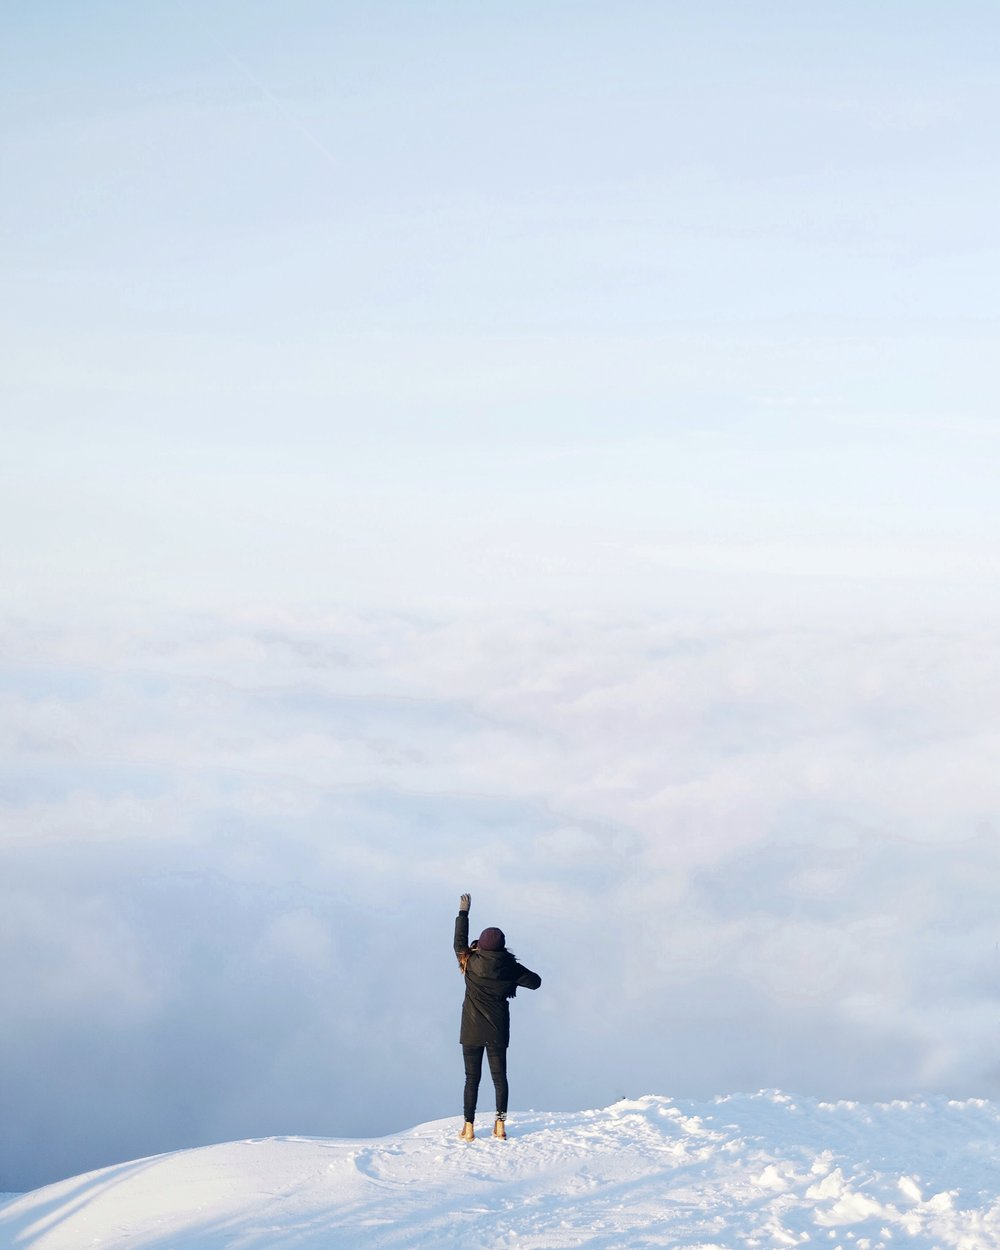 Ontop of a mountain by a social media photographer